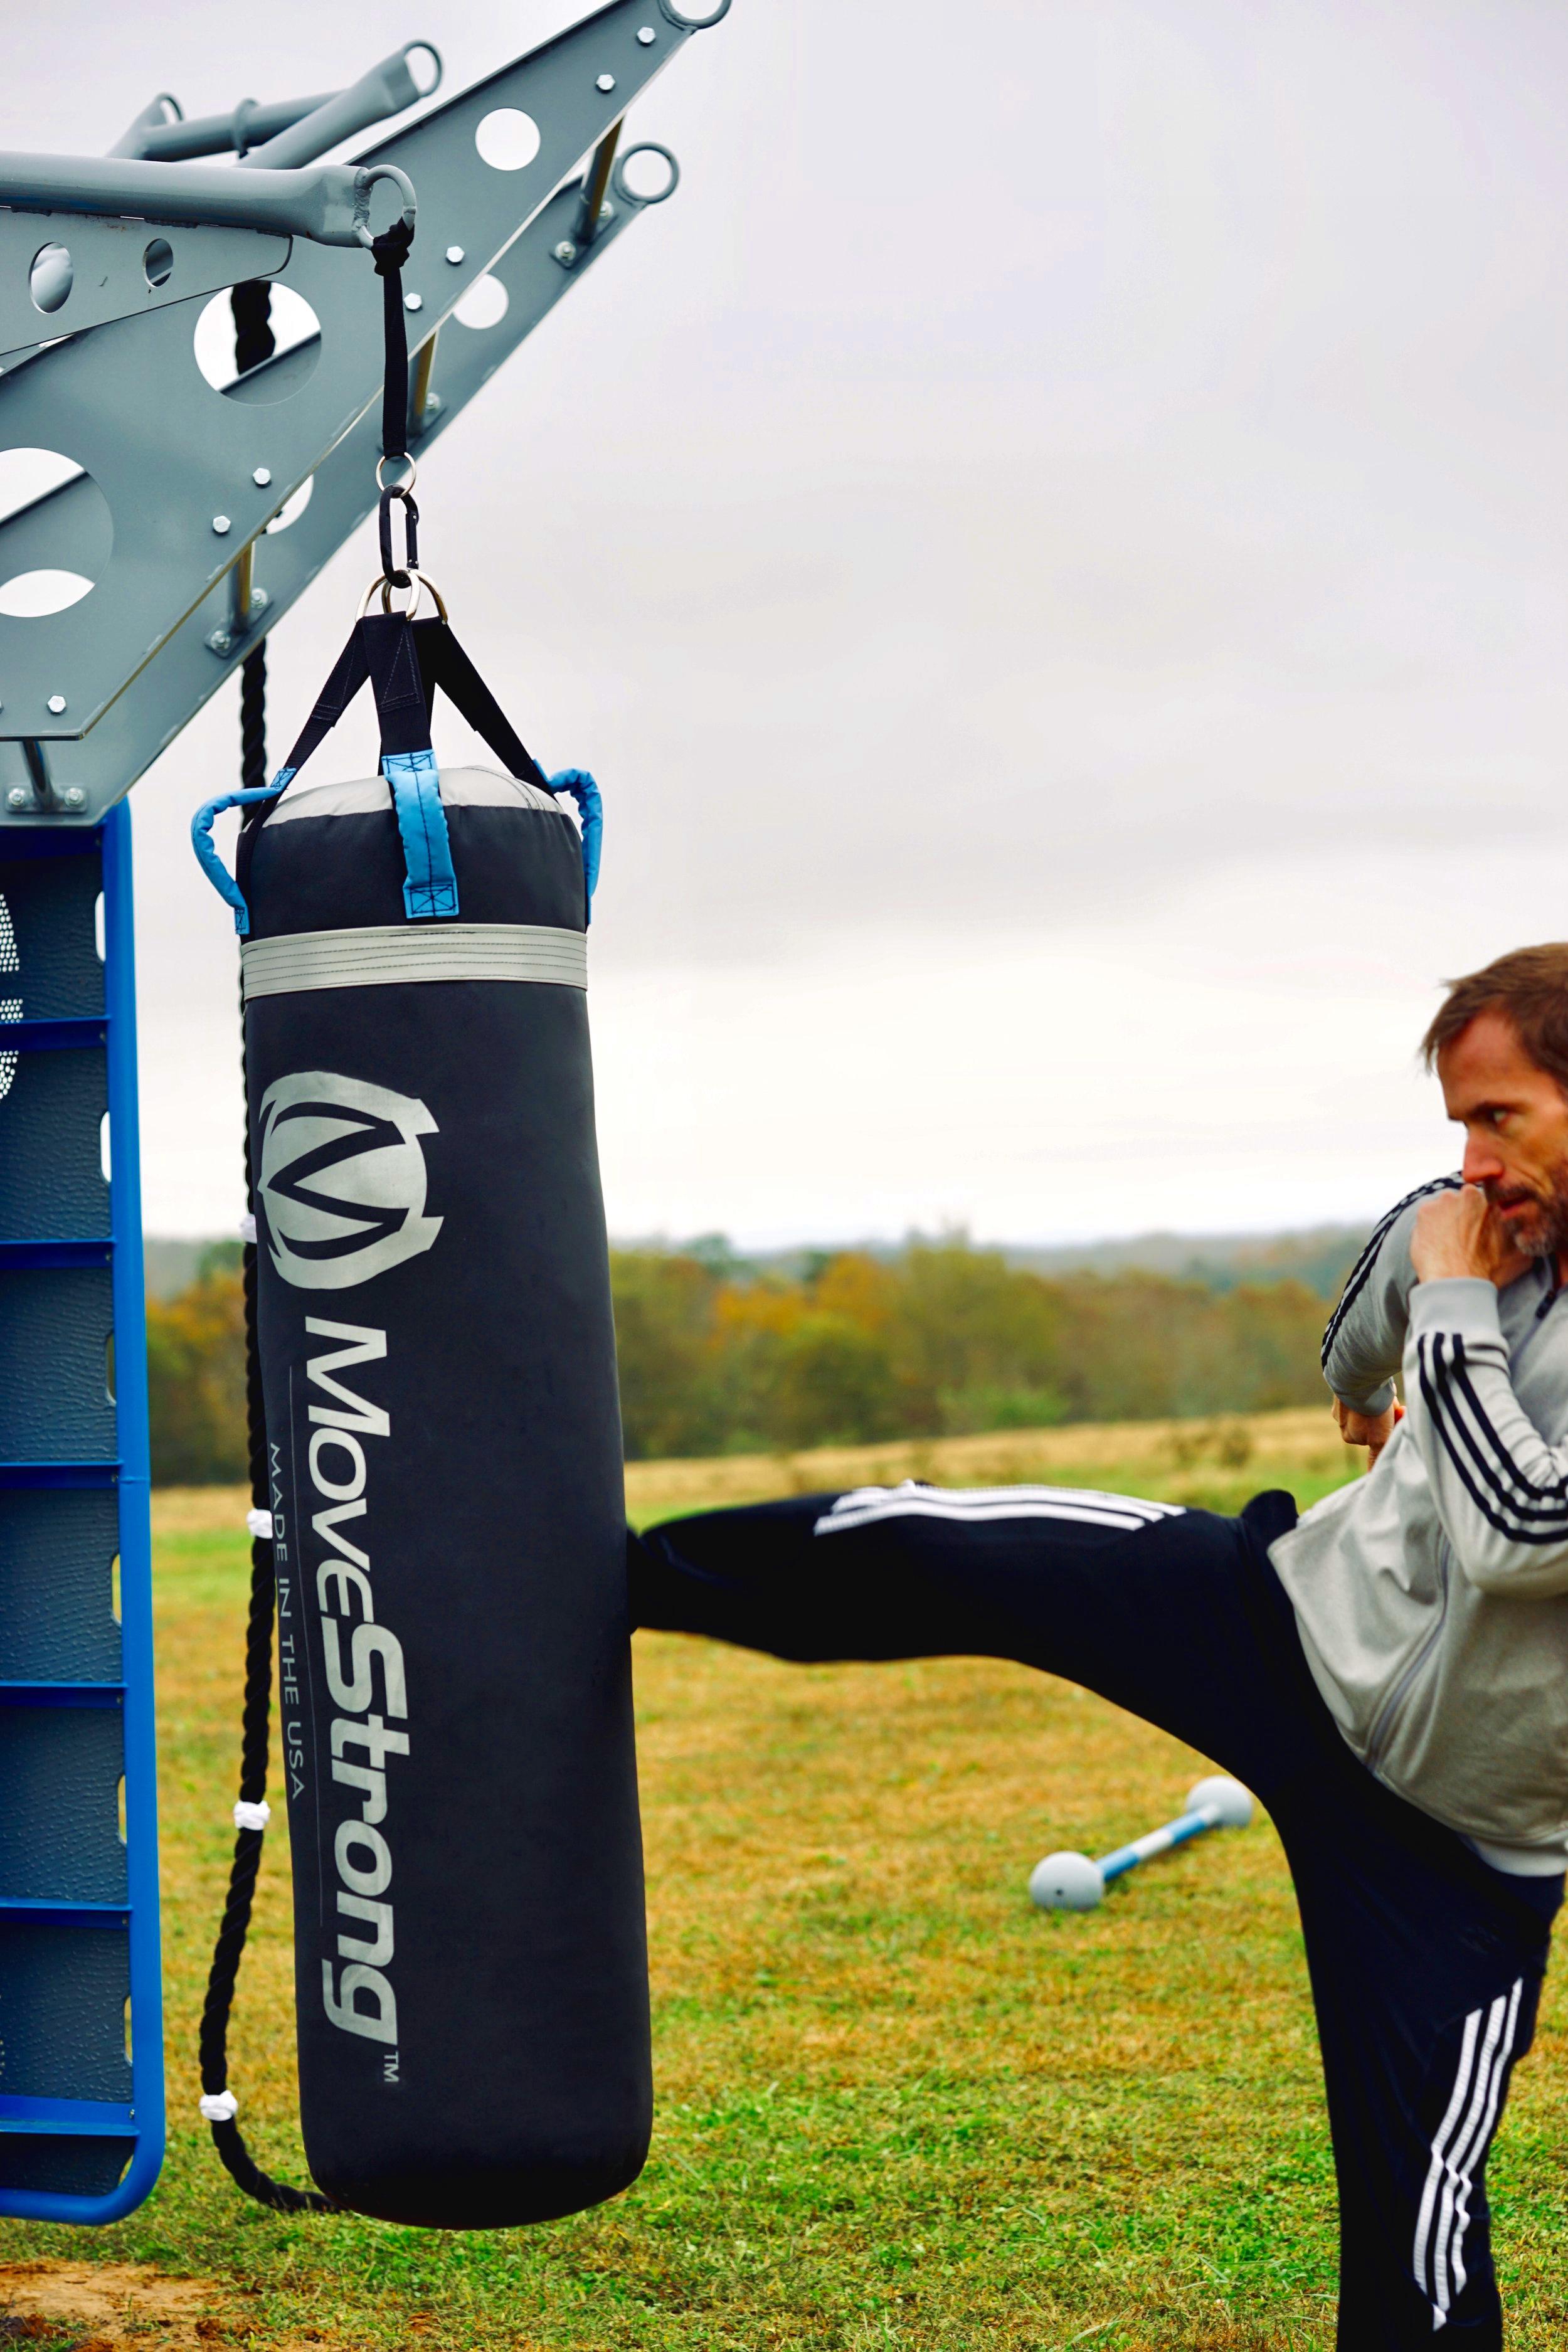 Outdoor fitness kickboxing fitness heavy bag